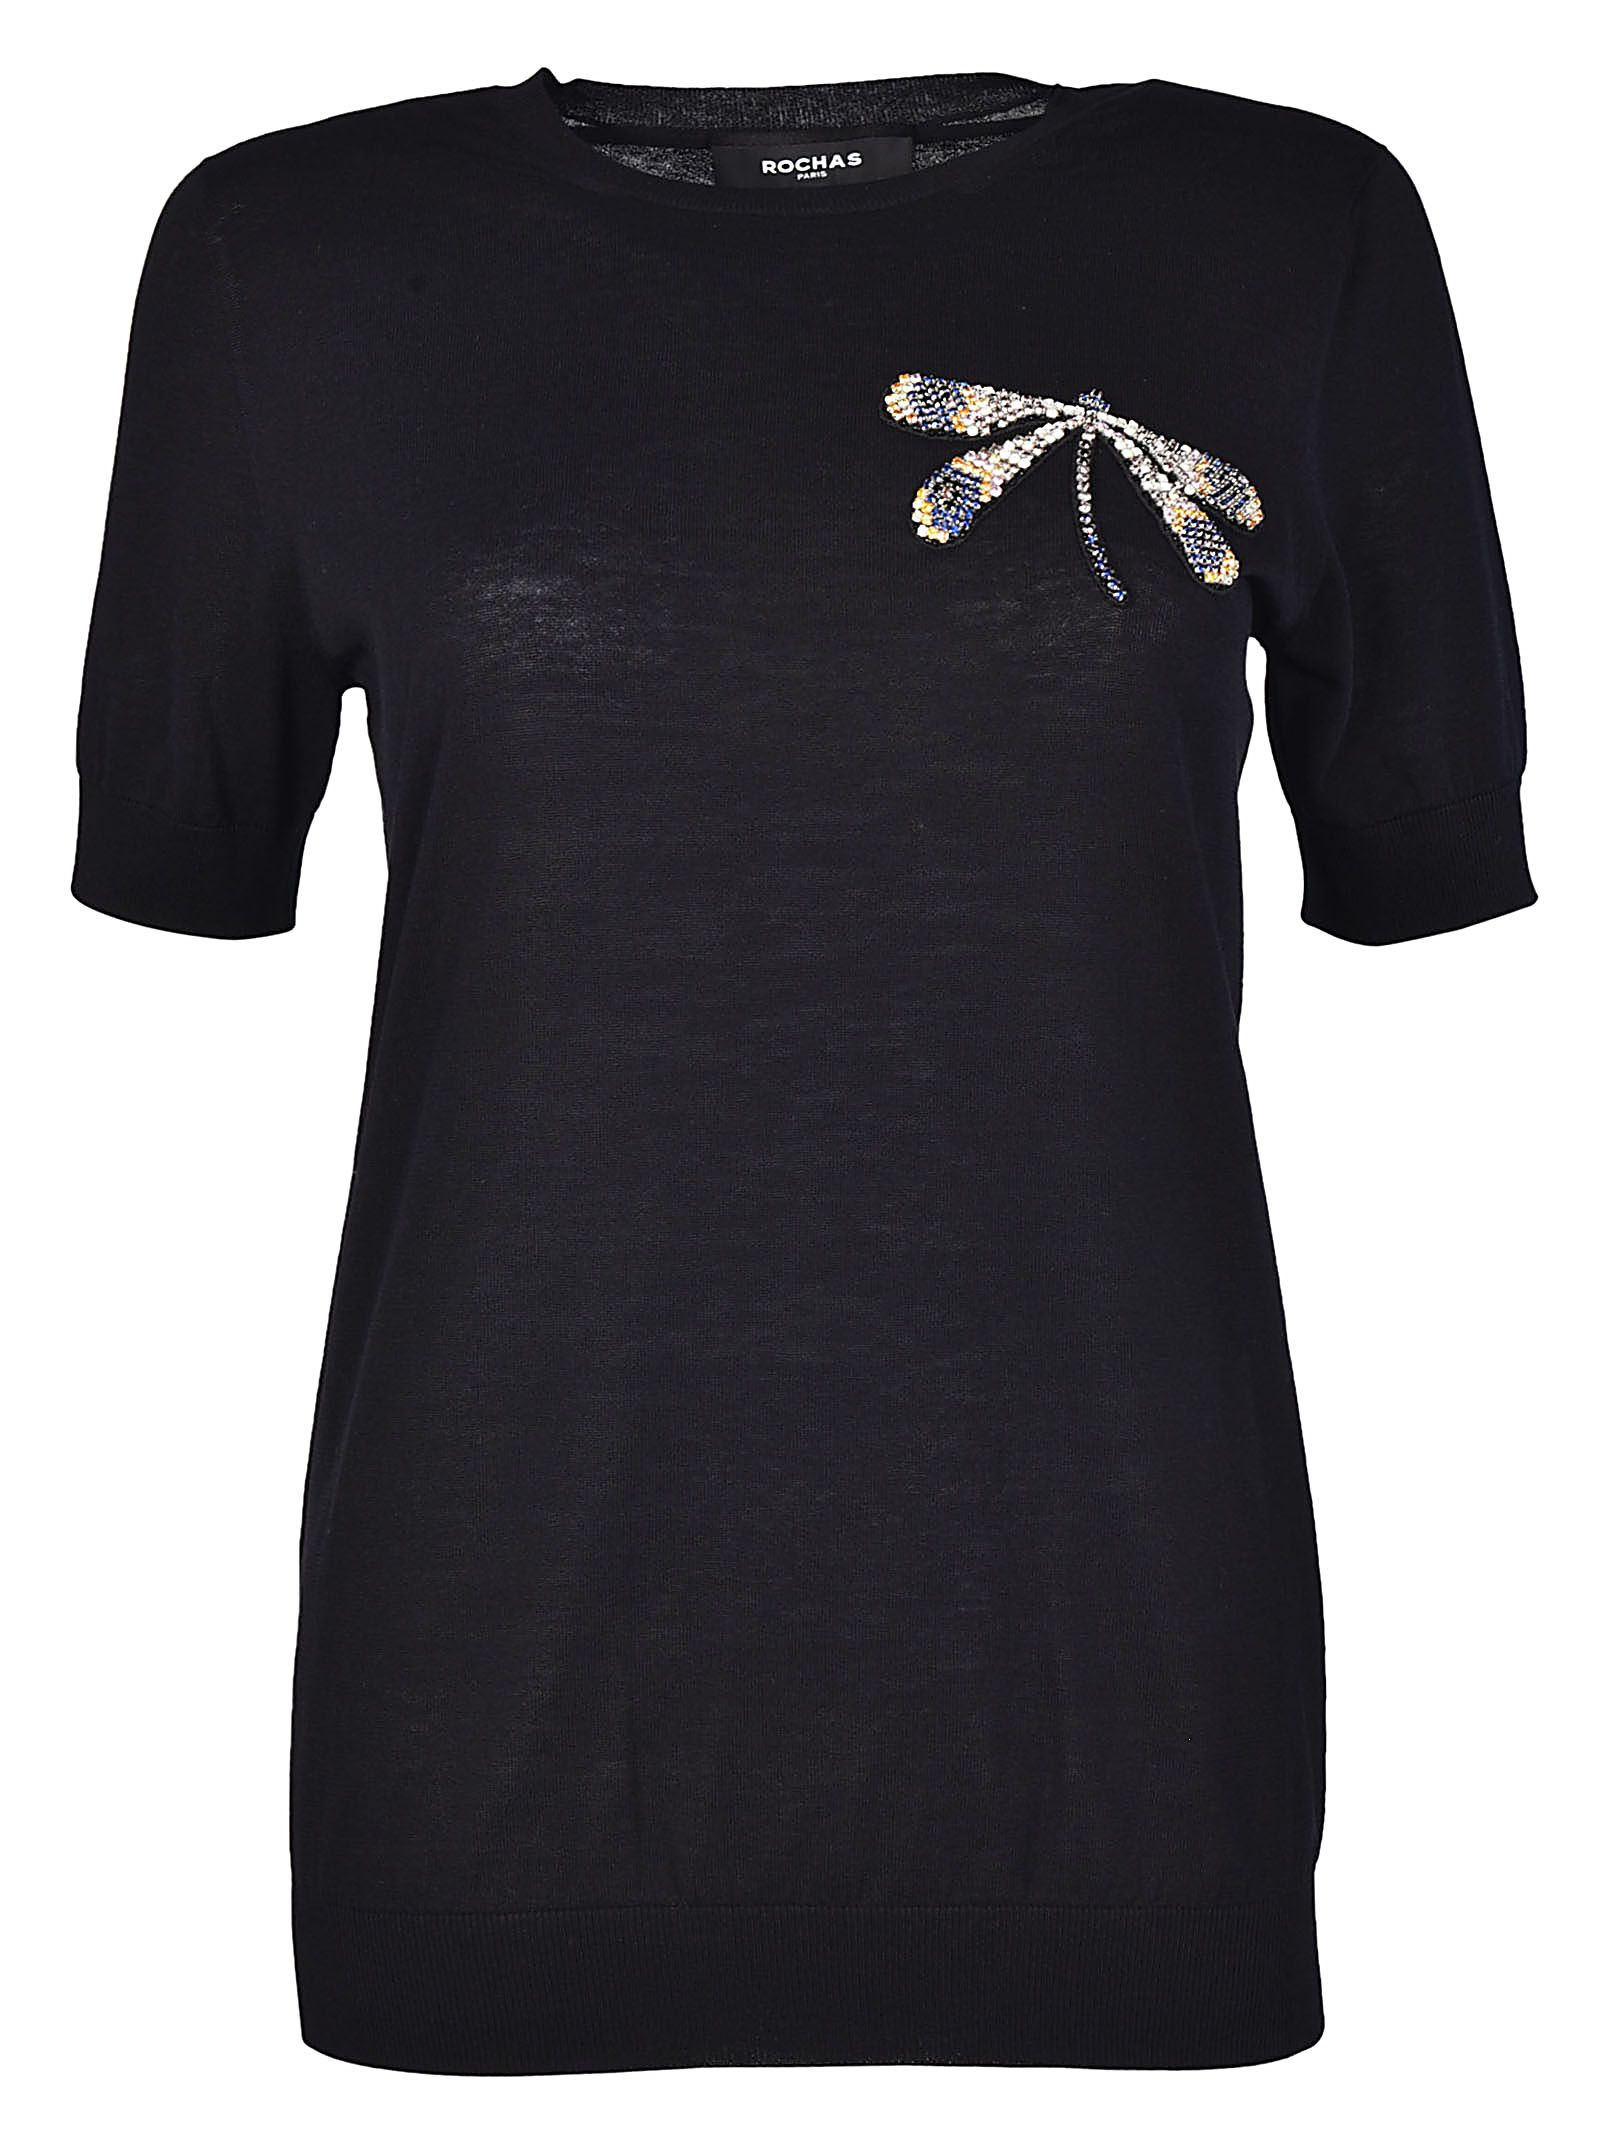 Rochas Embellished T-shirt